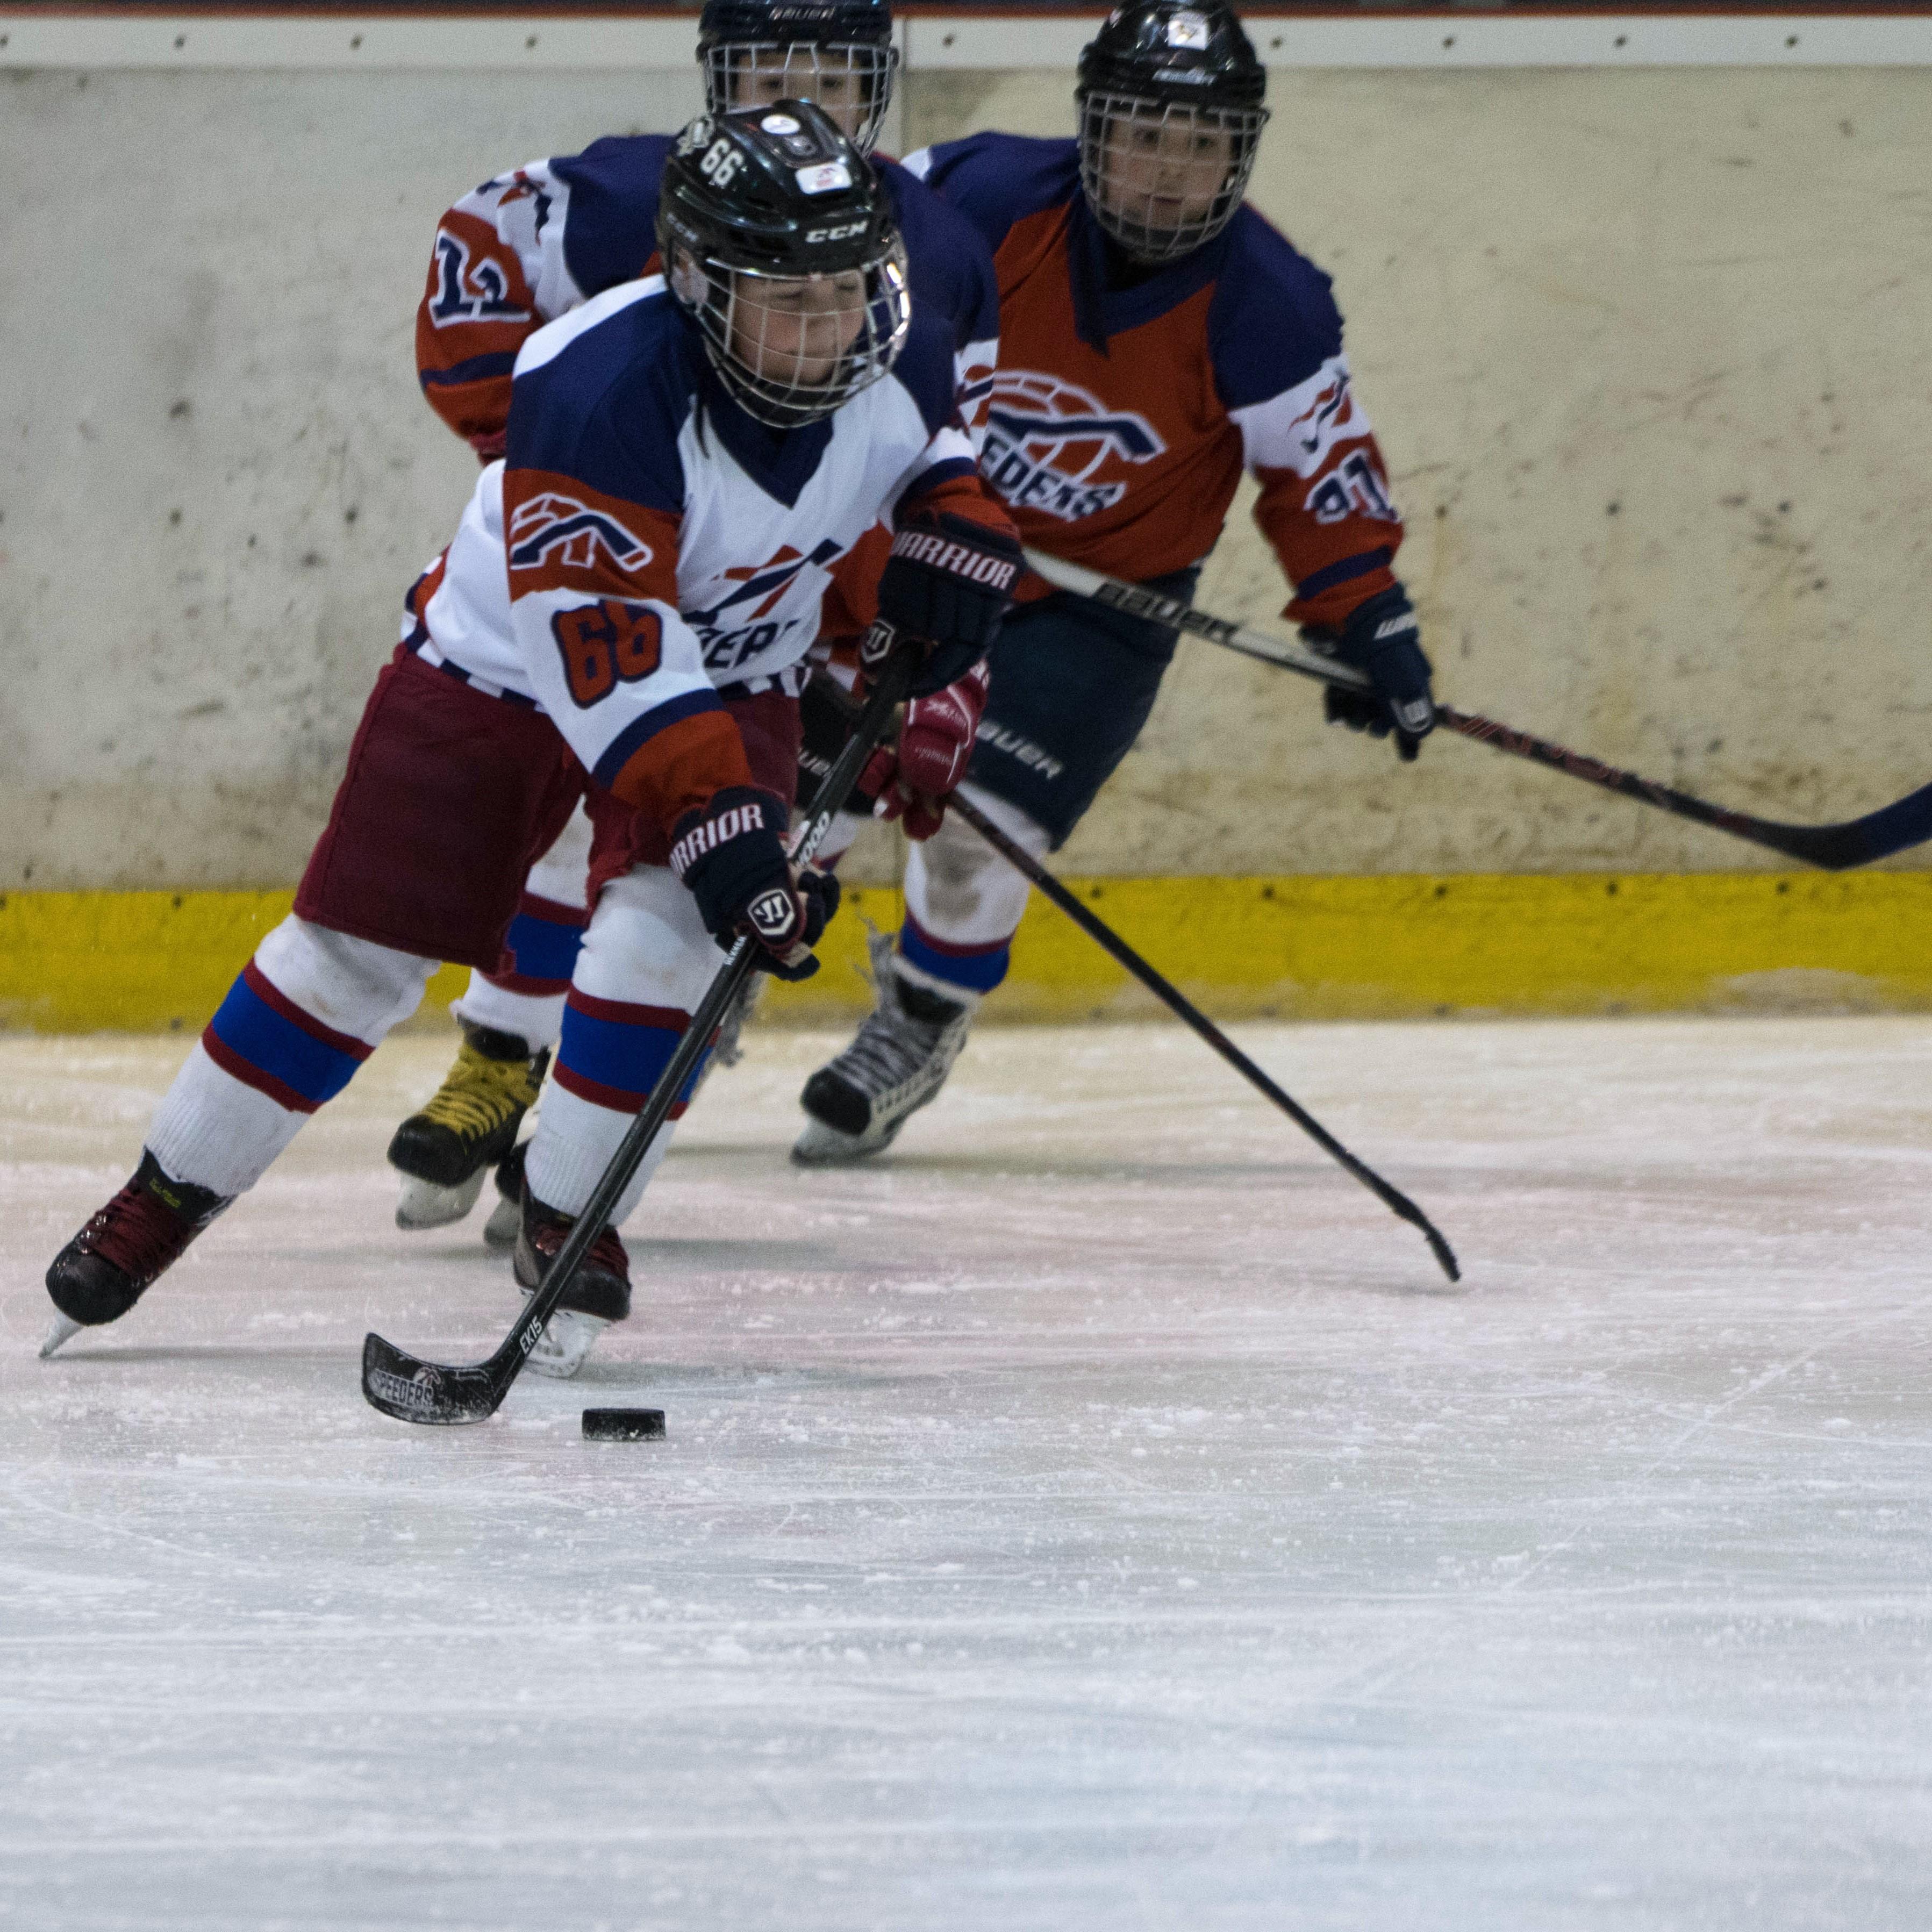 Speeders_sezona 2018_19 hokej turnaj lucenec 17